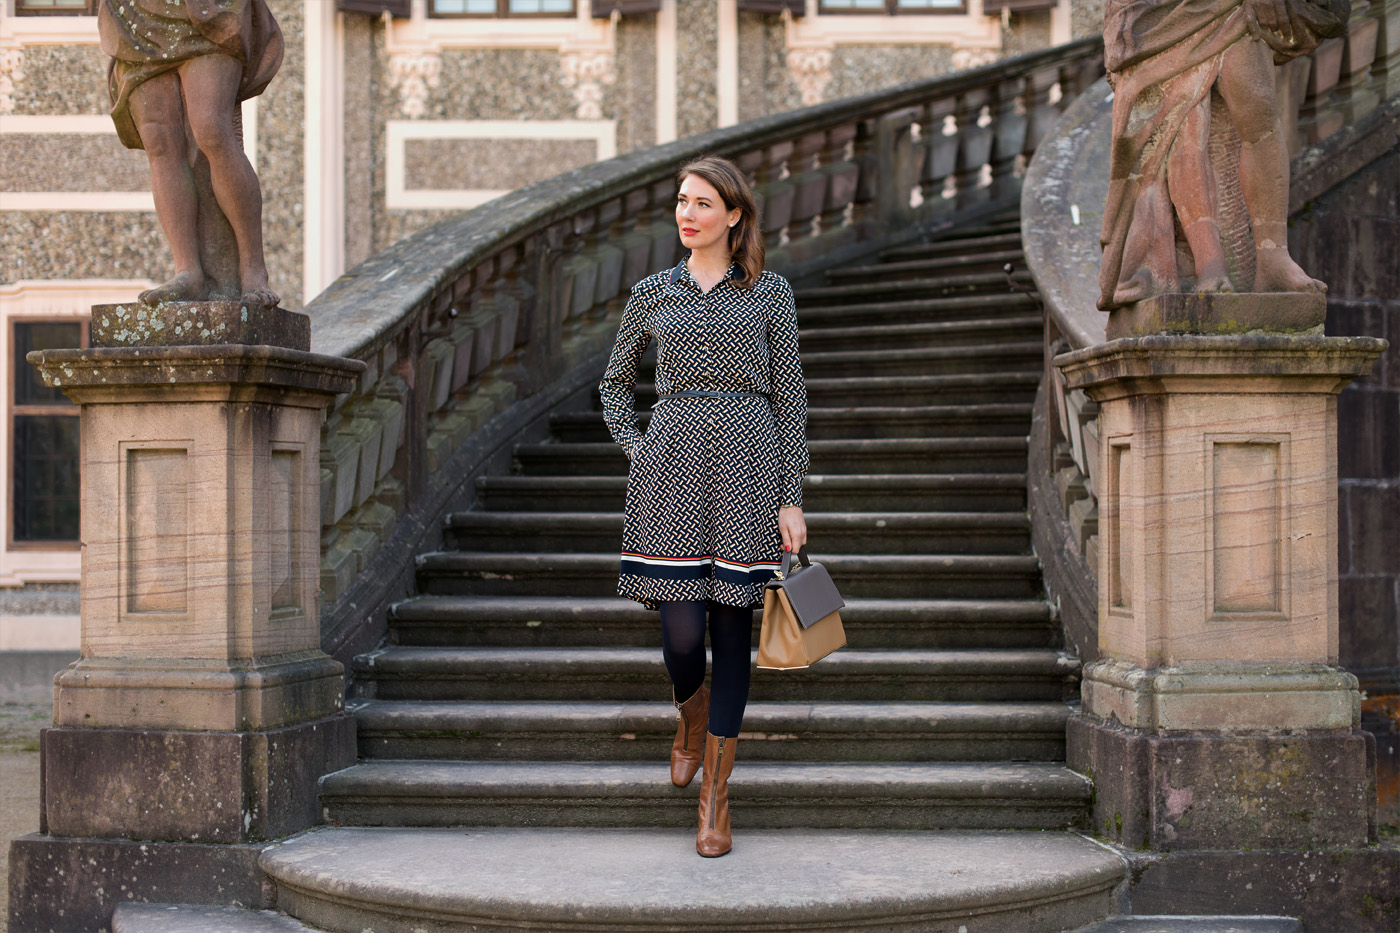 tommy-hilfiger-kleid-dress-zara-bag-booties-fall-fashion-fashionblog-7